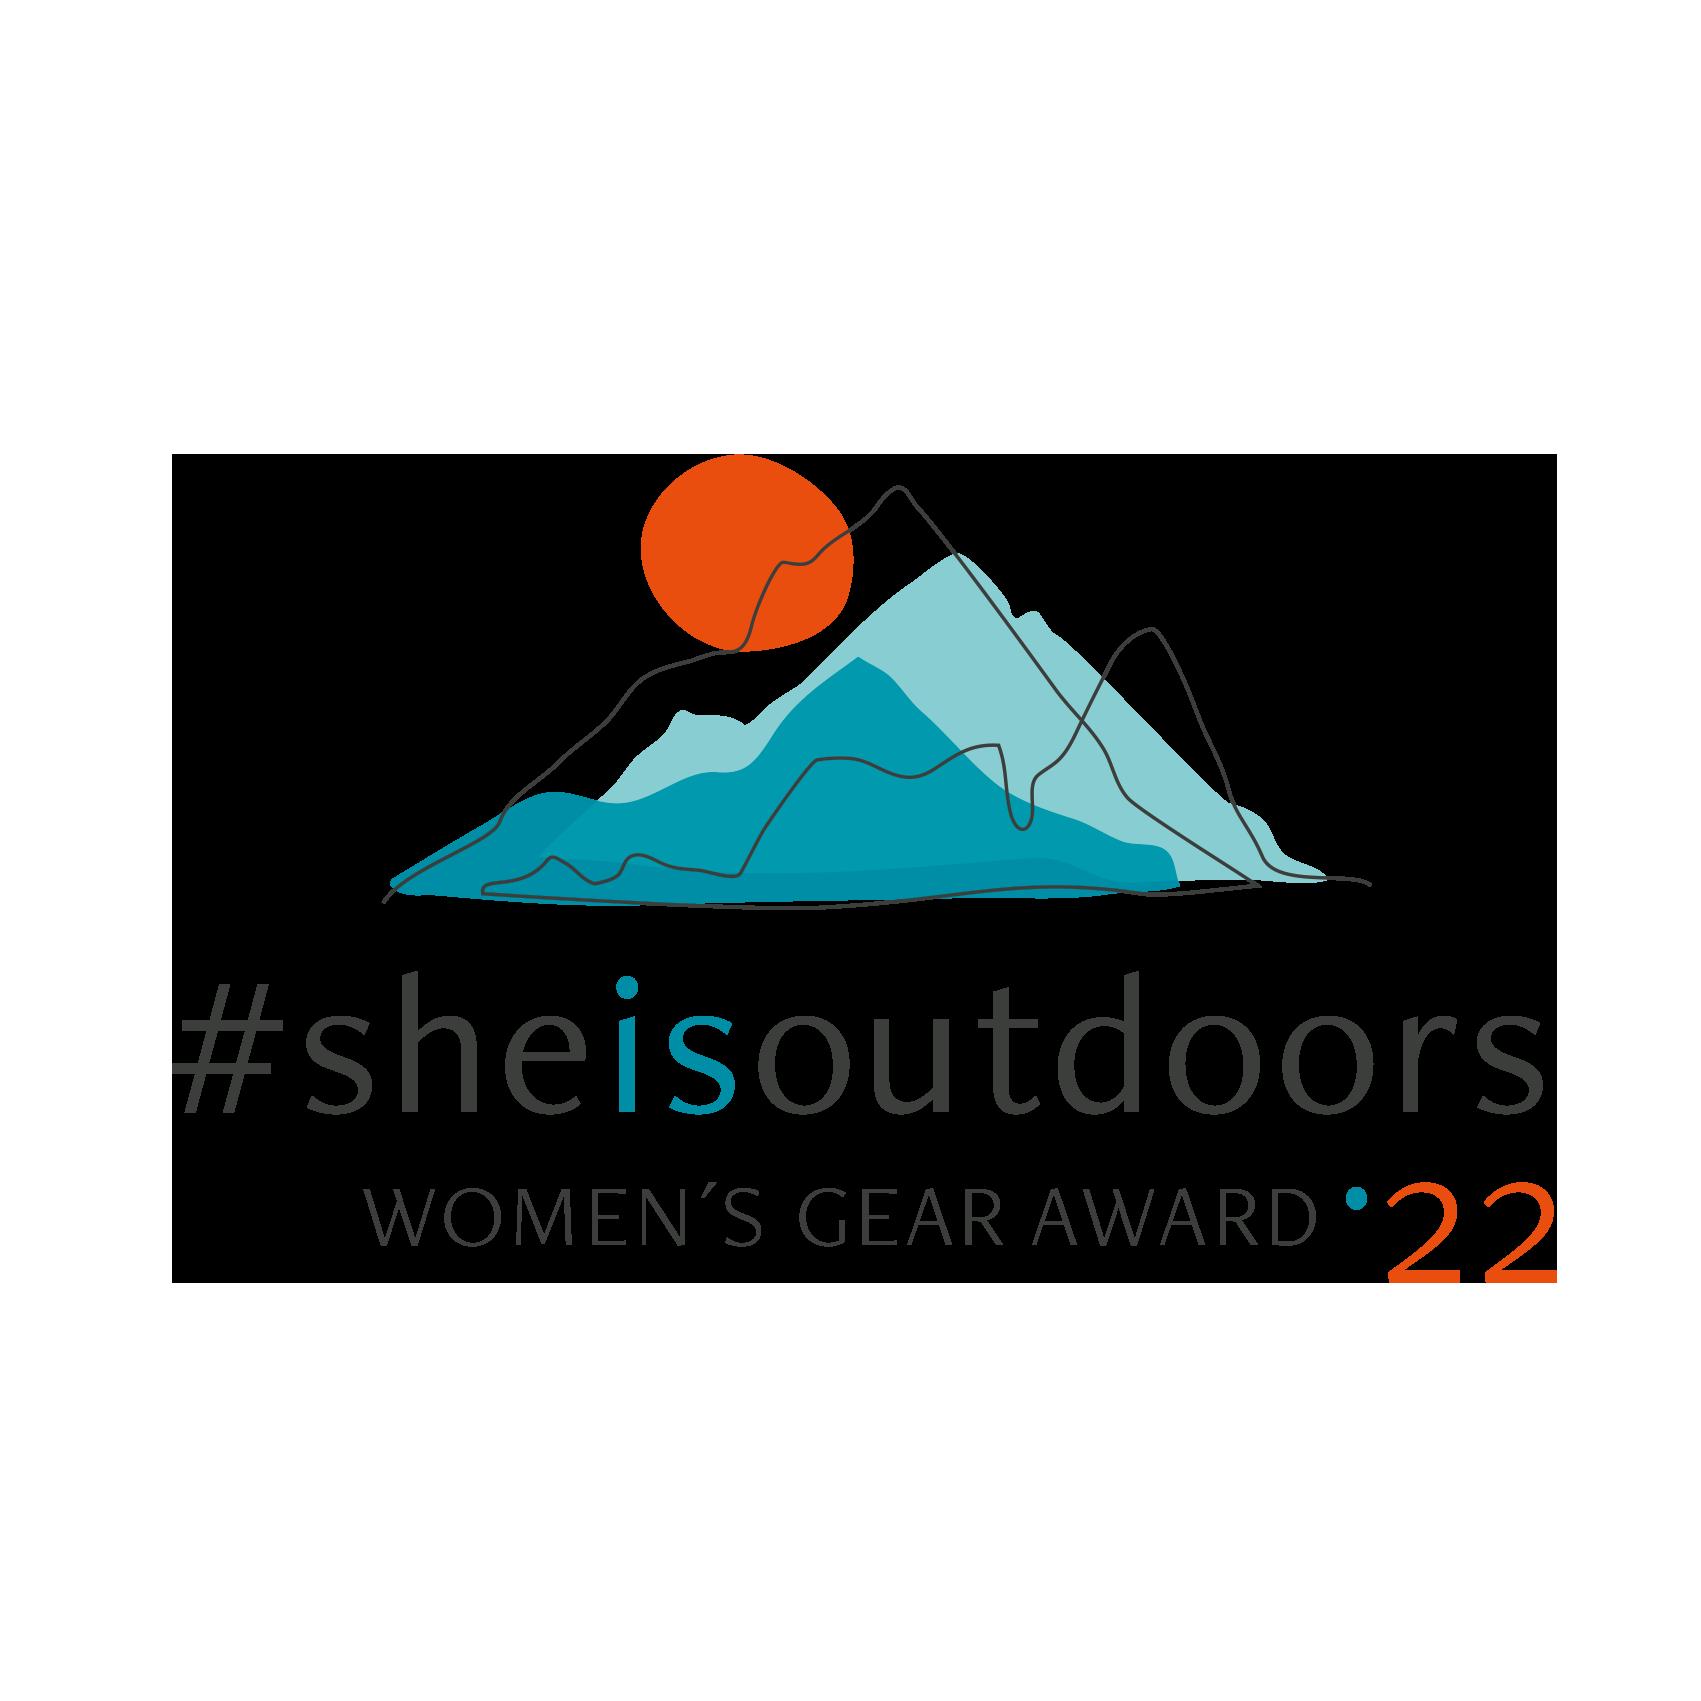 WOMEN'S GEAR AWARD - SUMMER 21 #she is outdoors –